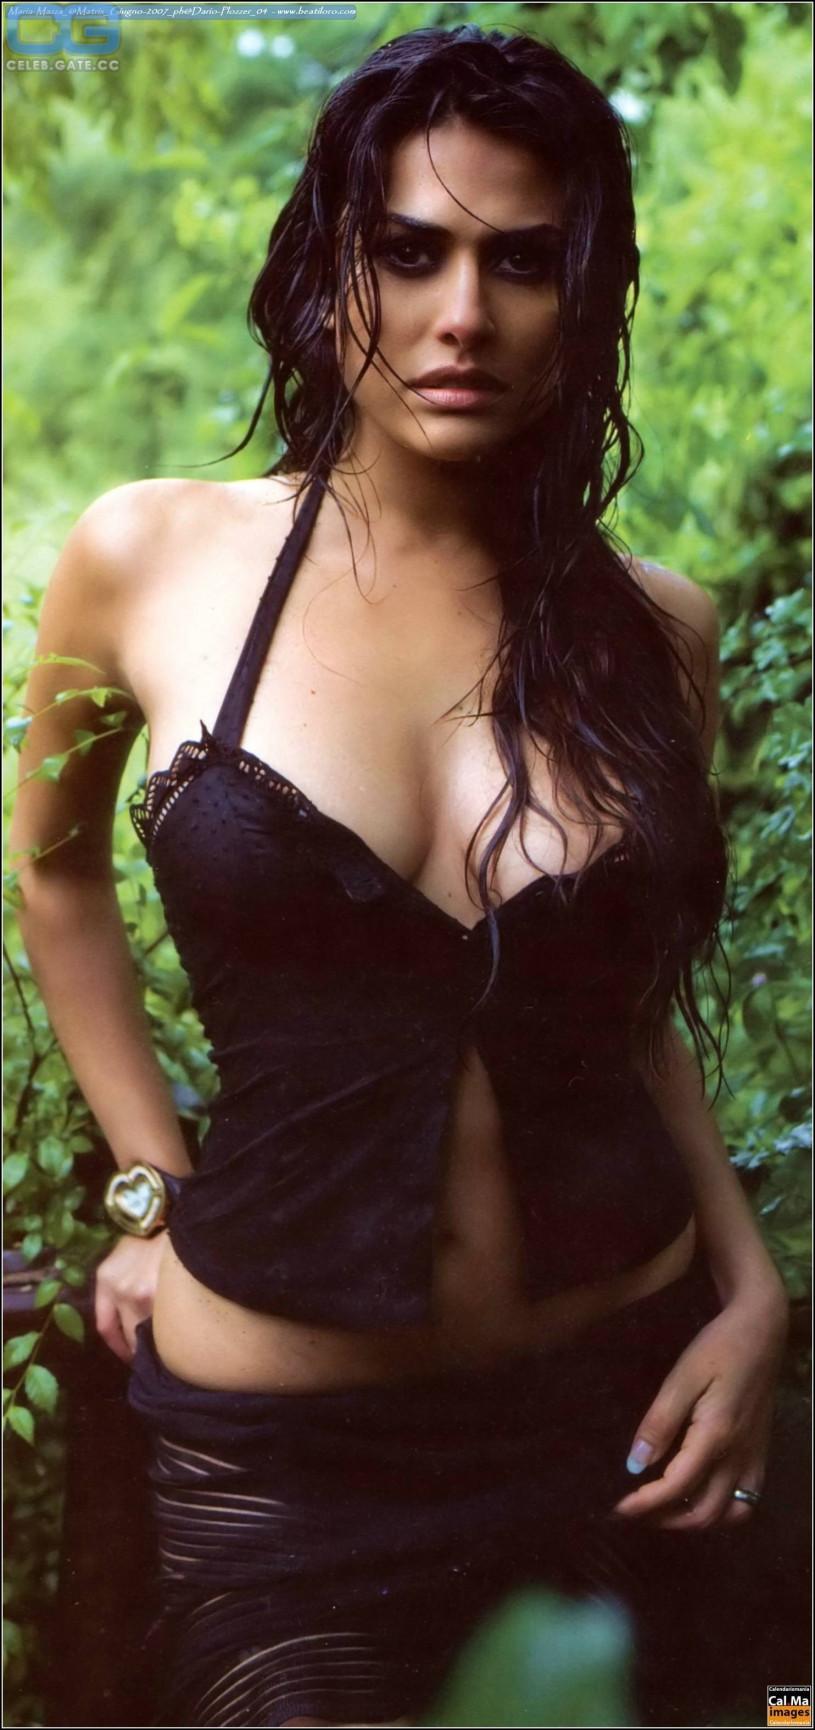 maria mazza topless